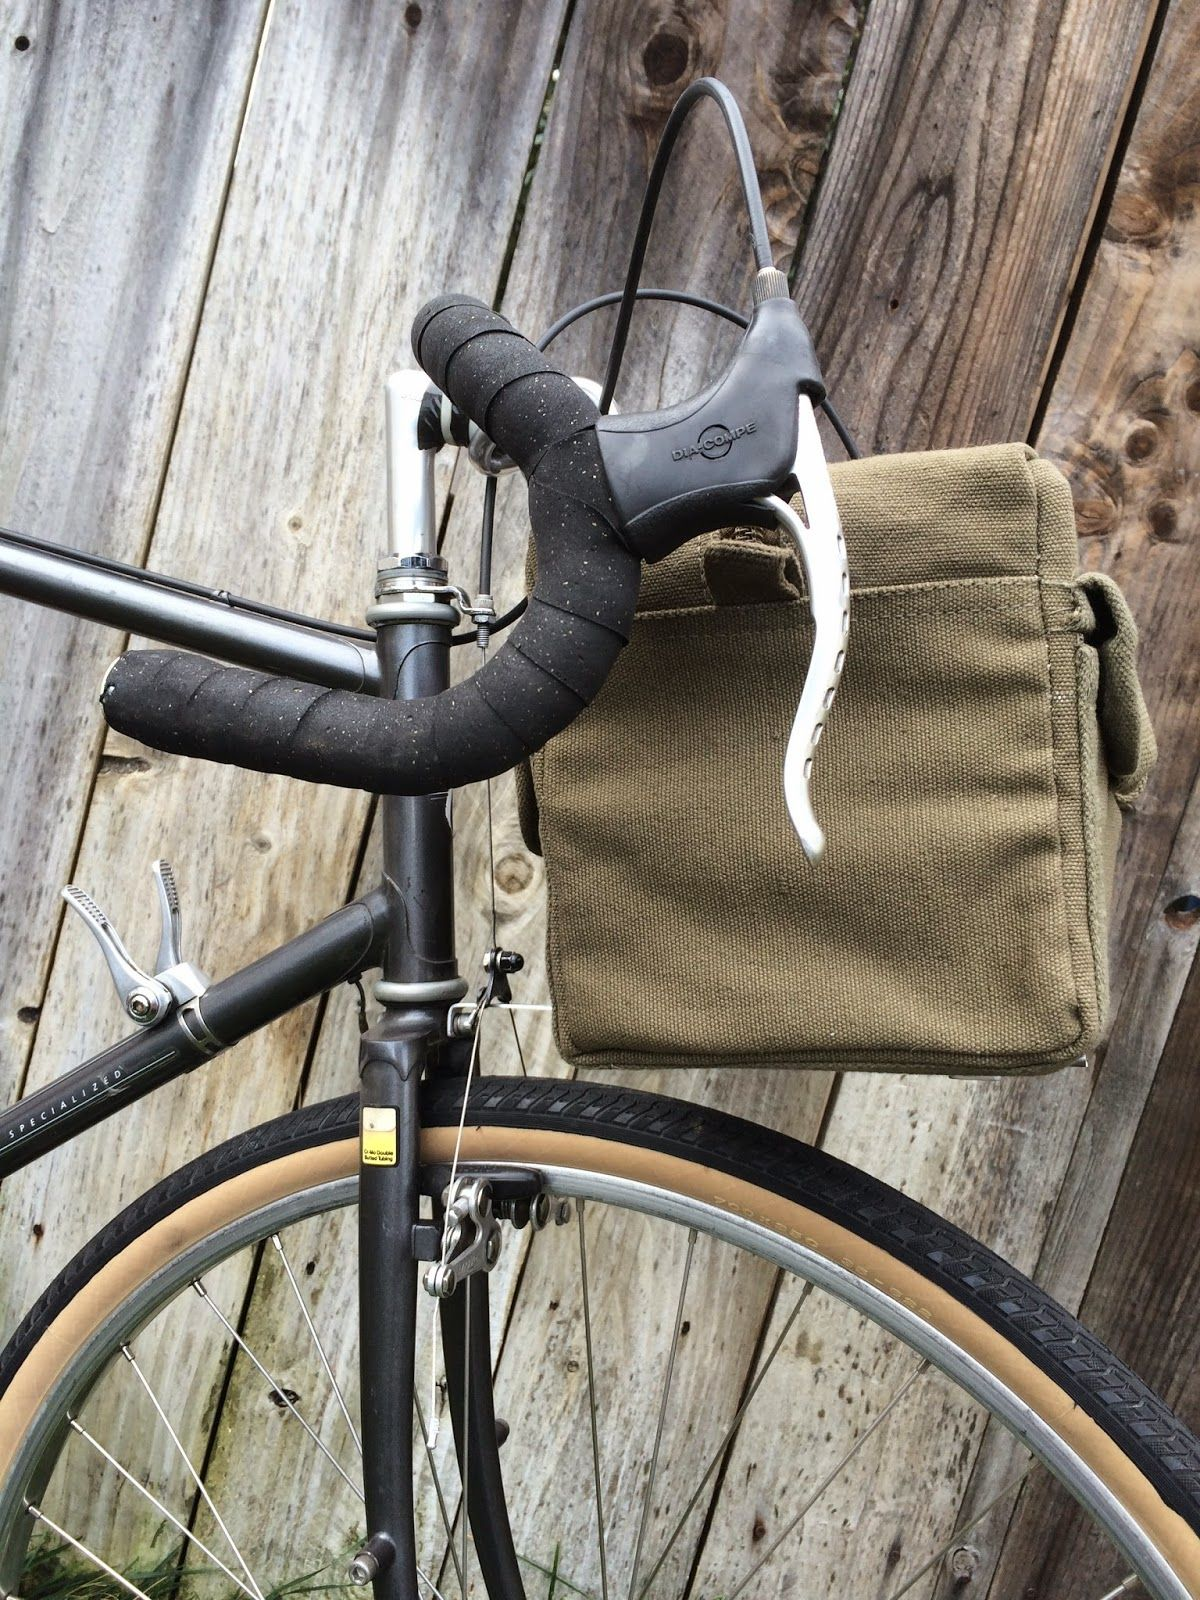 Diy Handlebar Bag And Support Rack Handlebar Bag Bike Bags